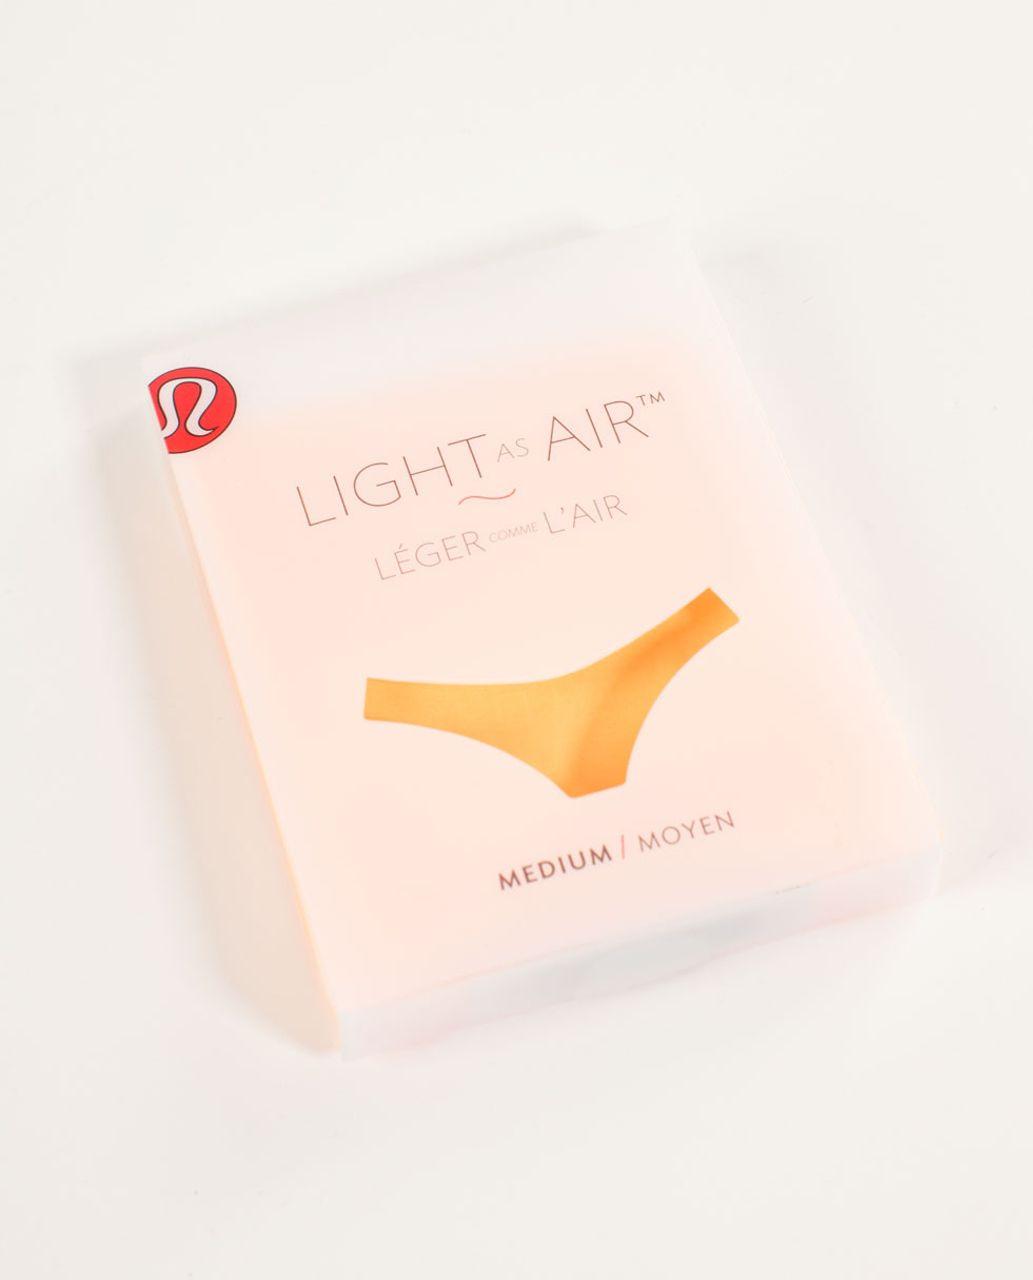 Lululemon Light As Air Thong - Creamsicle Pop